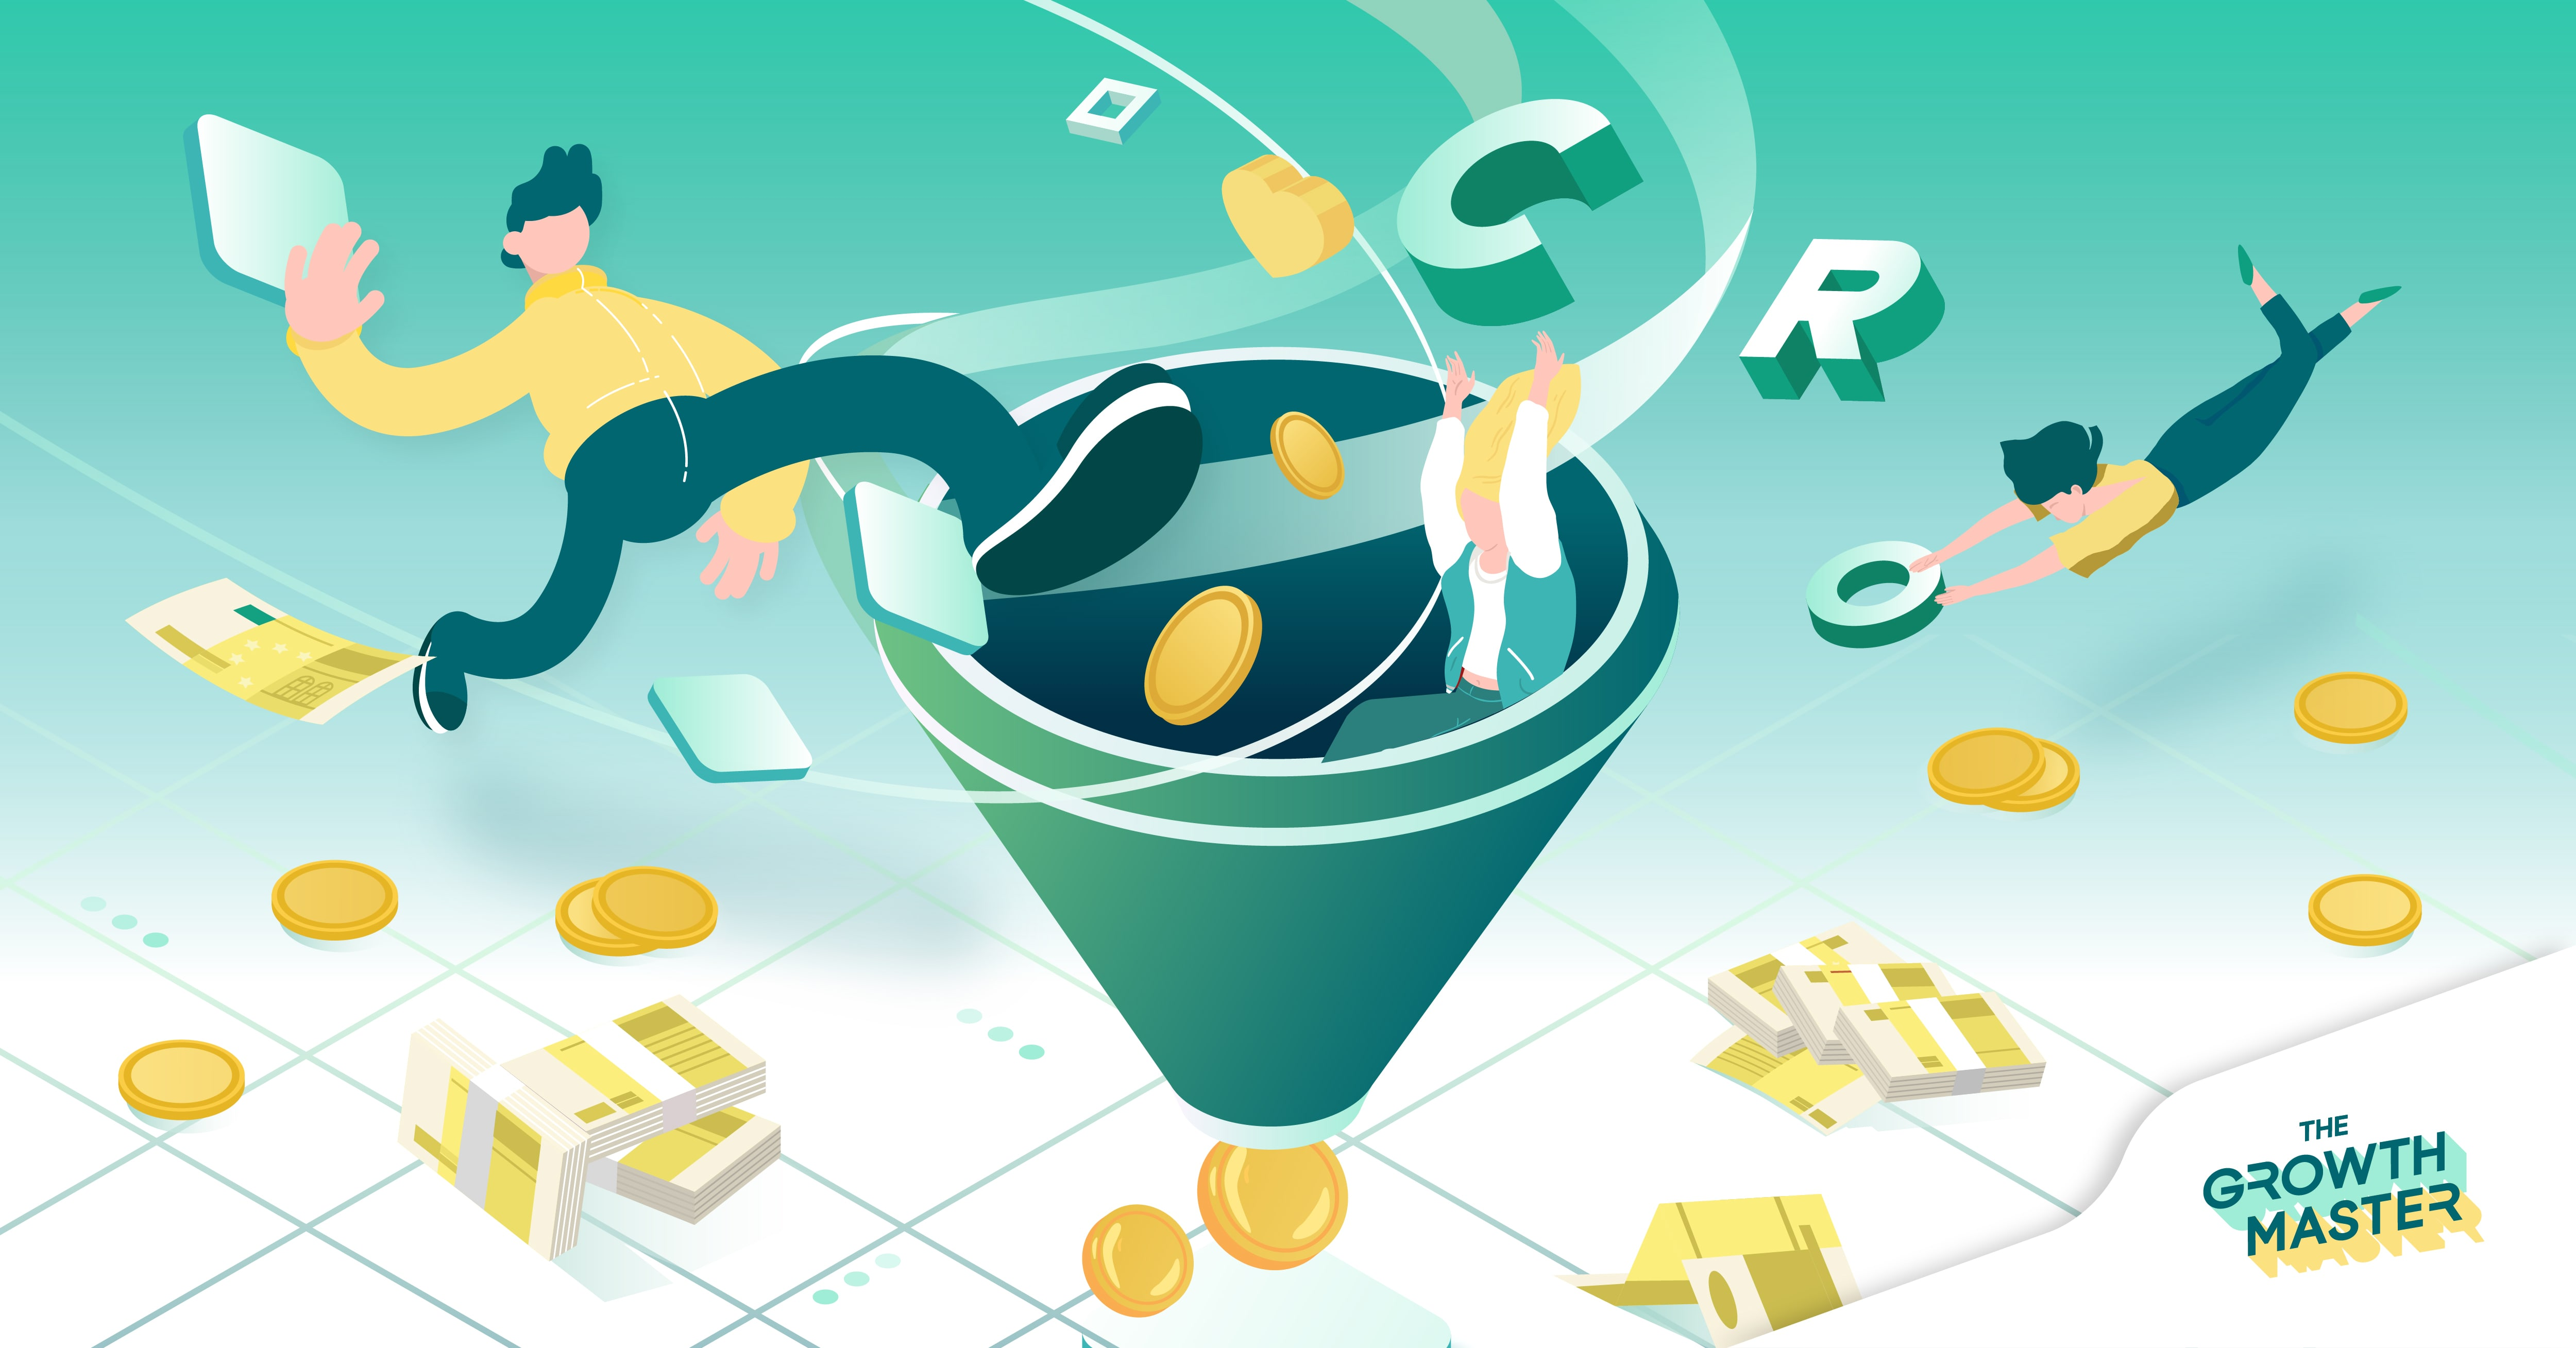 CRO Guide : รวมเทคนิคการทำ CRO ให้ธุรกิจออนไลน์ของคุณได้ลูกค้ามากขึ้น (แบบที่คุณทำได้ทันที)